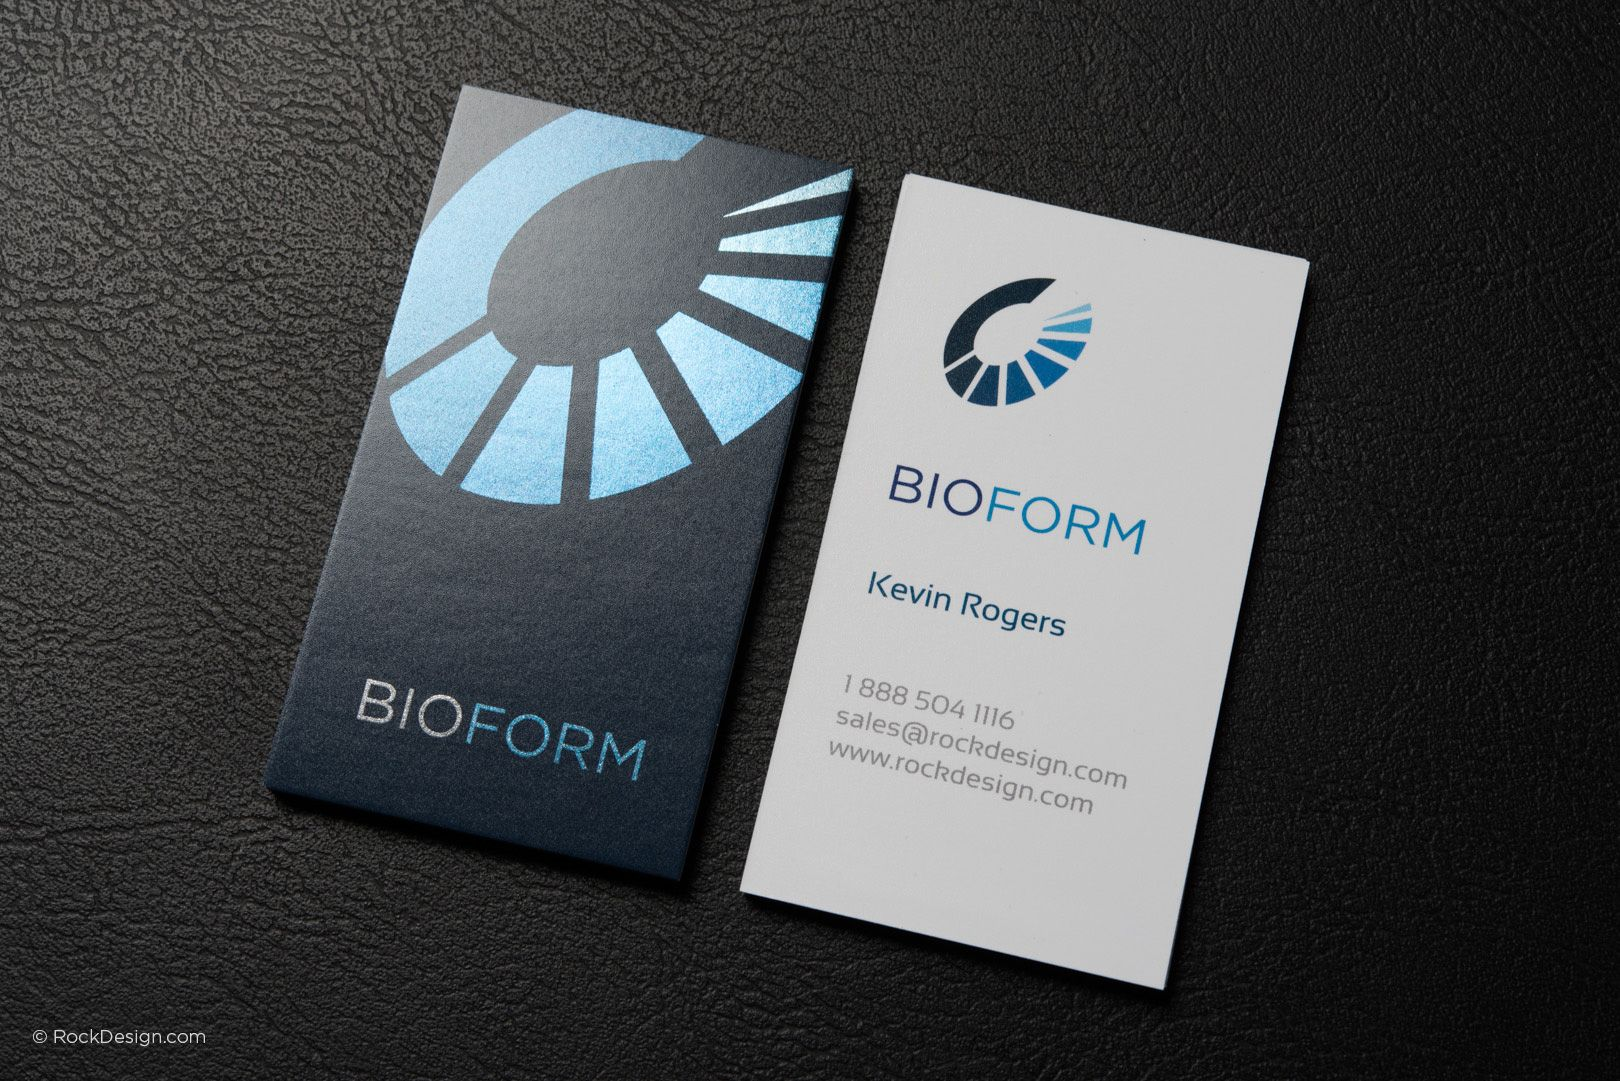 Diamond modern shiny look business card template - Bioform ...